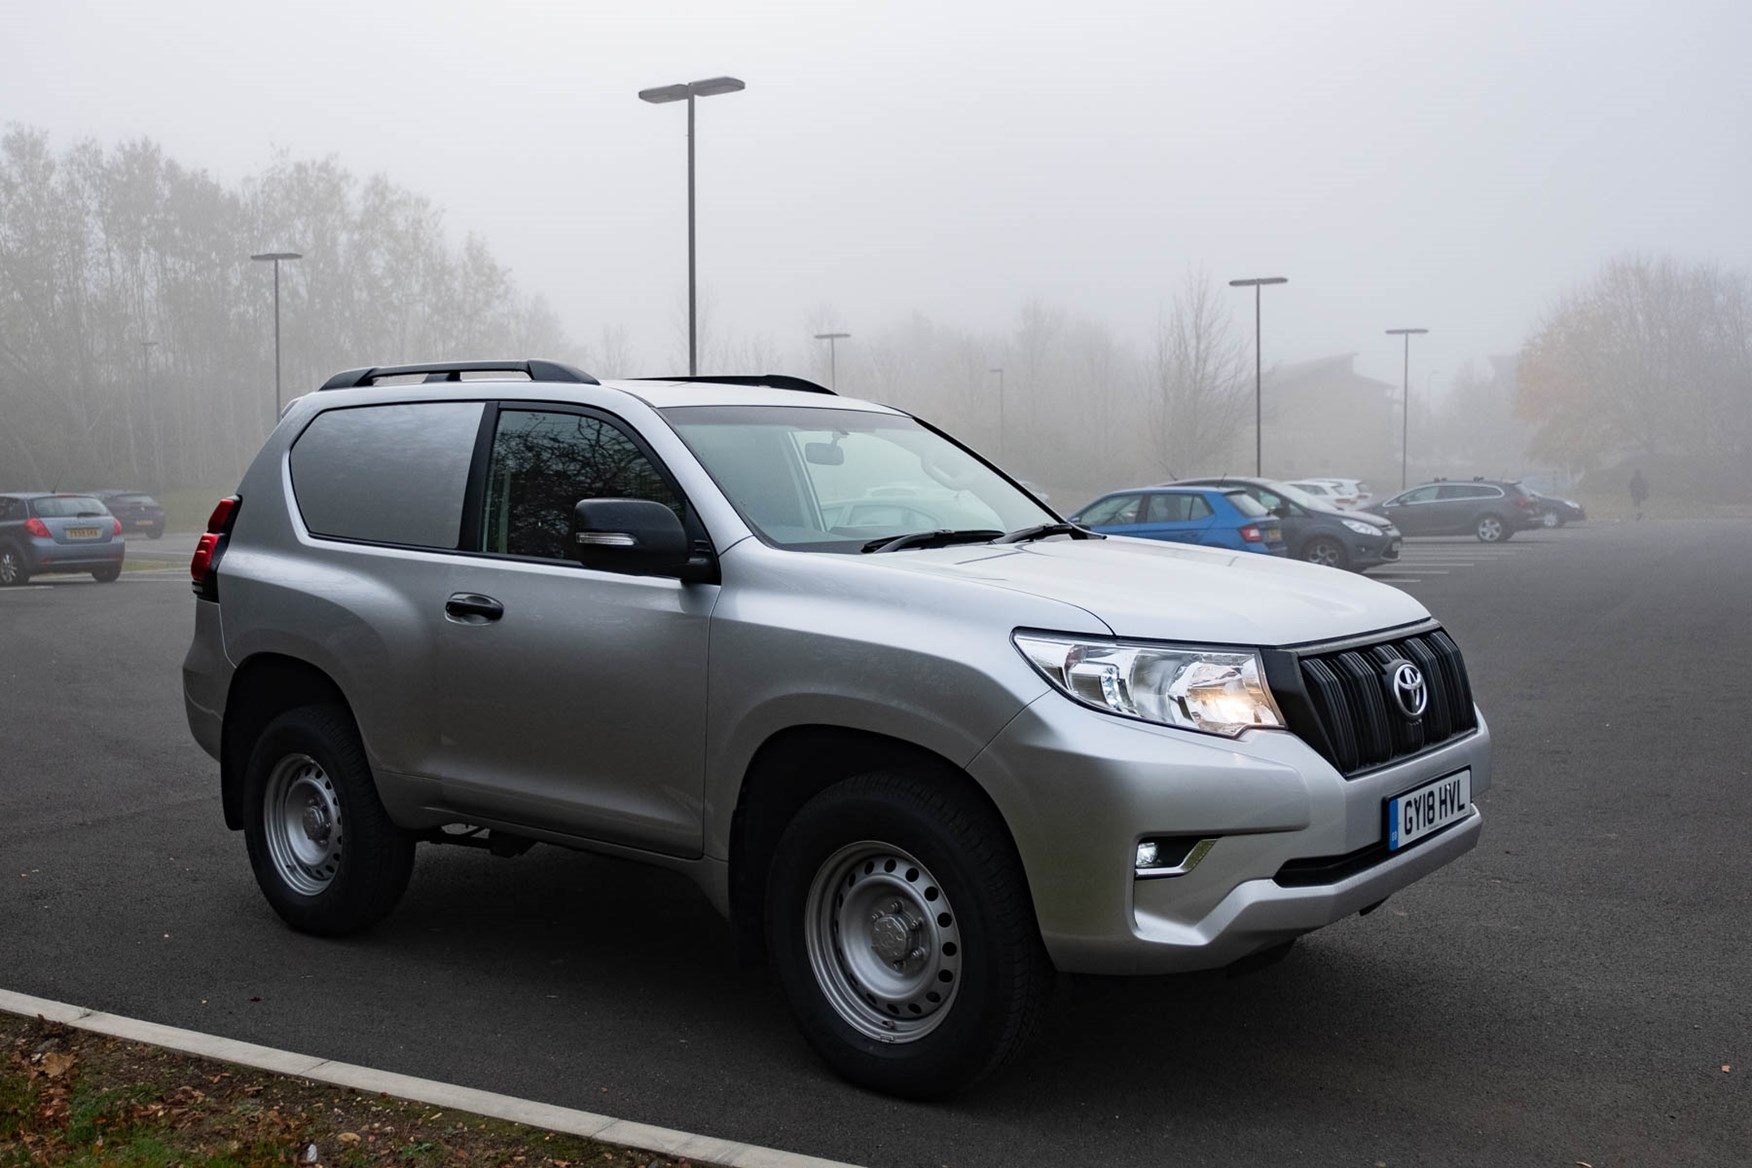 Toyota Land Cruiser Utility - SWB - foggy